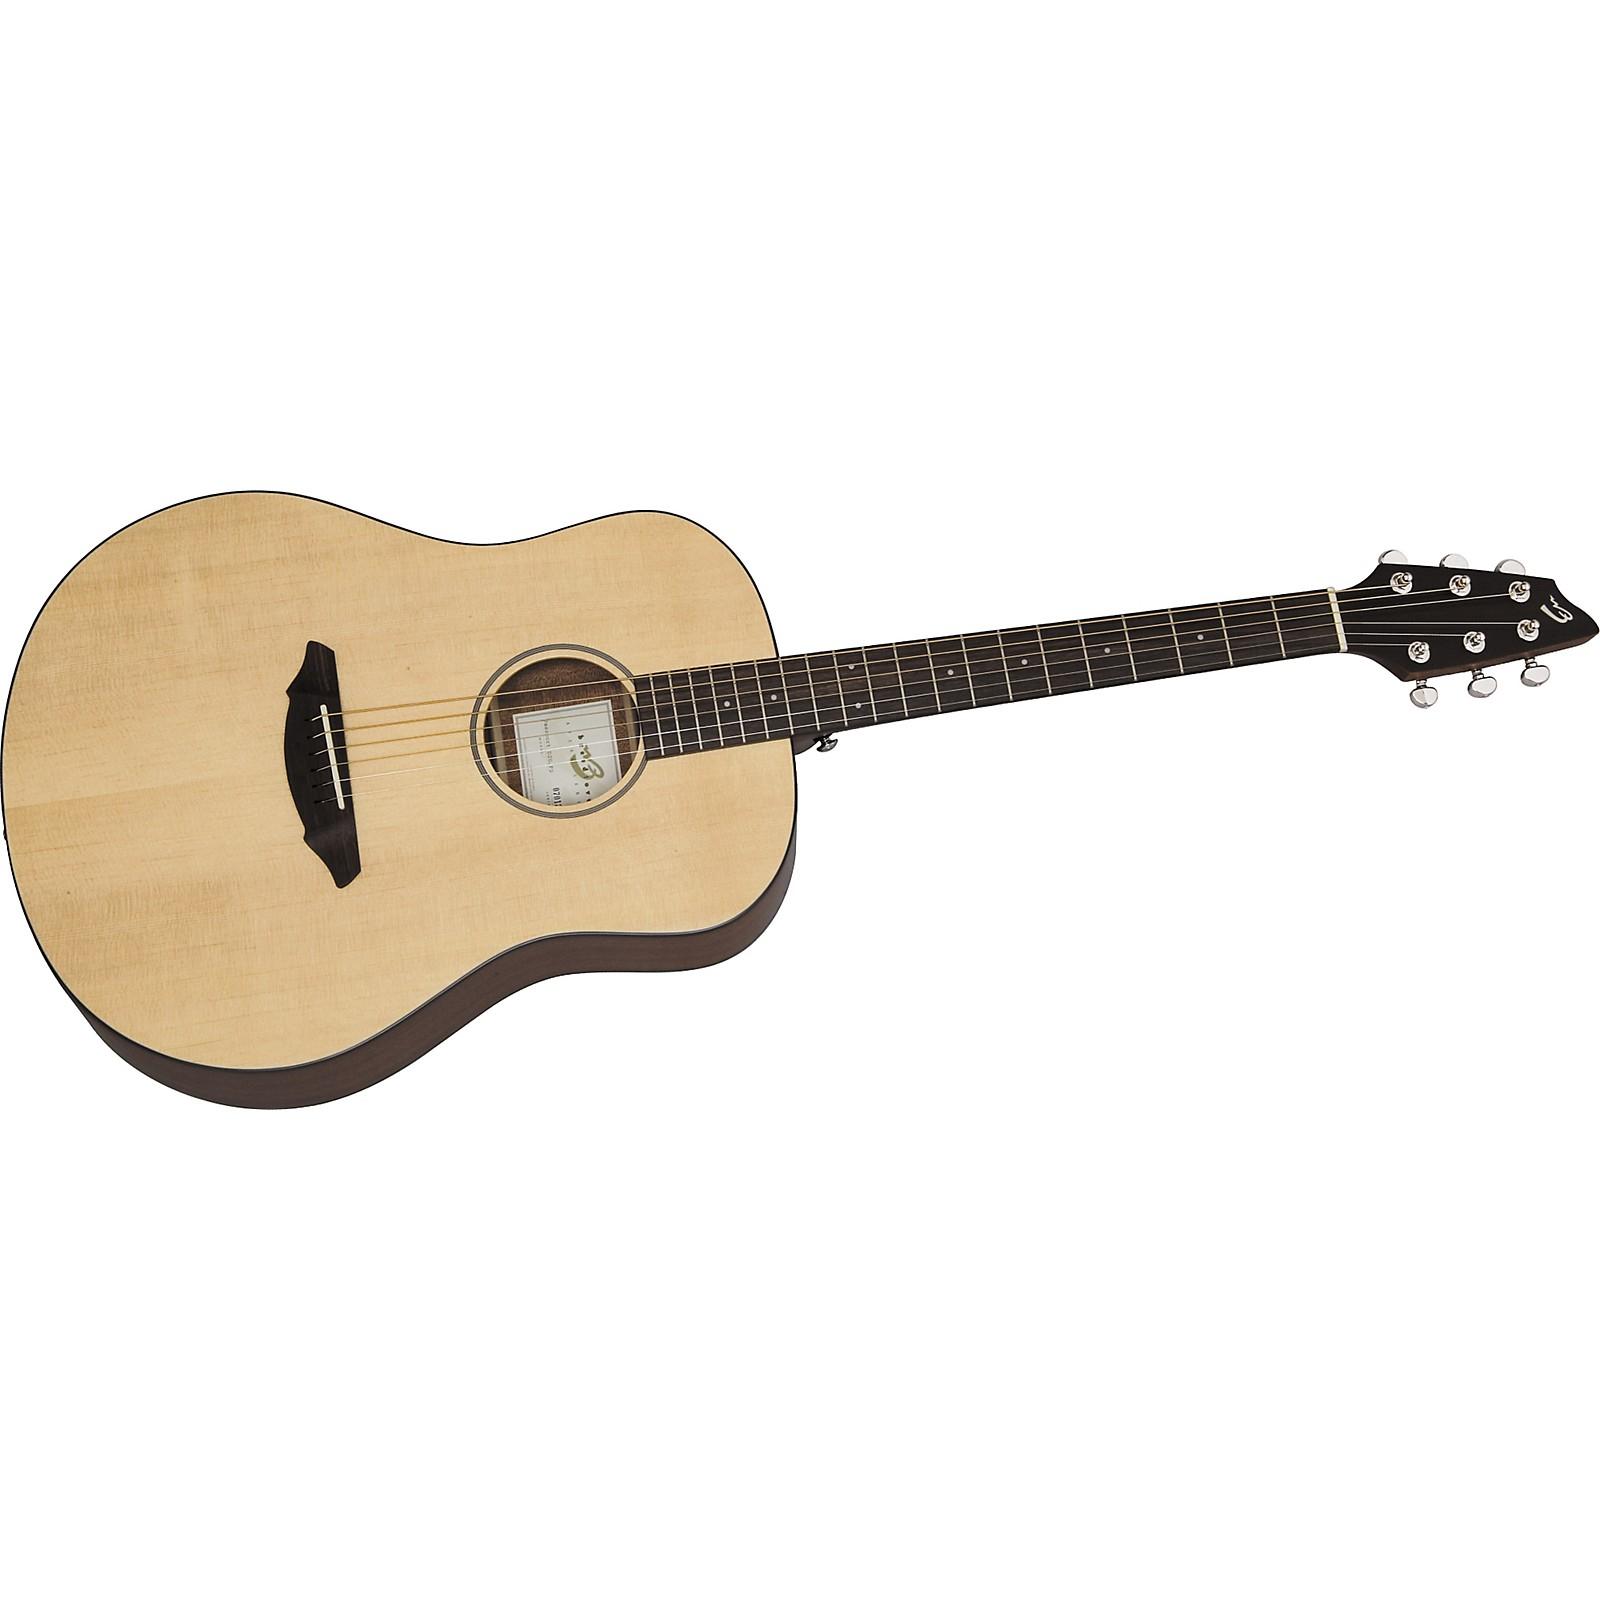 Breedlove Passport D200\/SM, T 7\/8 Acoustic Travel Guitar  Musician's Friend